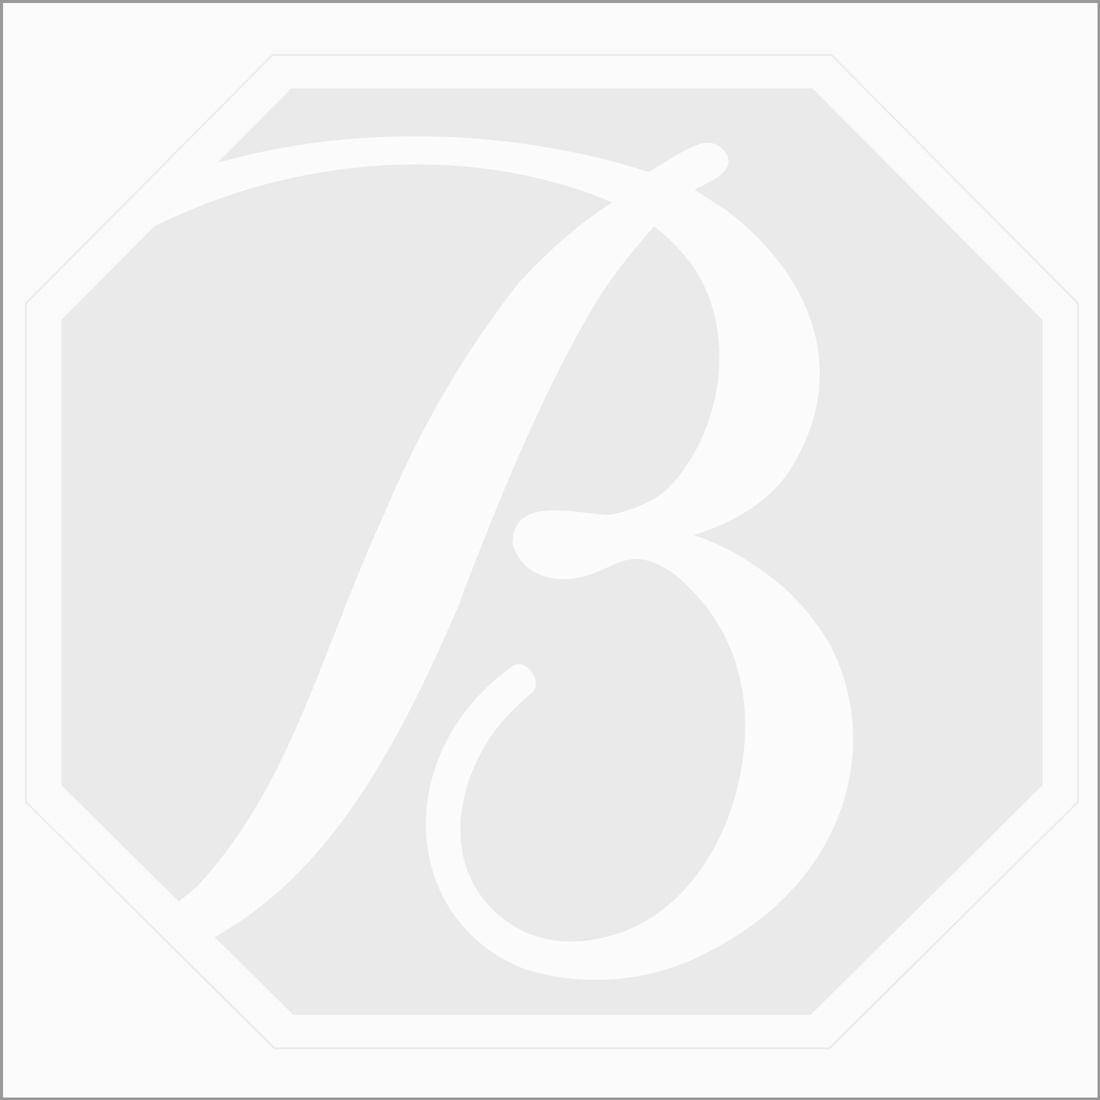 10 x 8 x 5 mm - Black Pear Shaped Rose Cut Diamond  - 5.45 carats (FncyDiaRC1126)